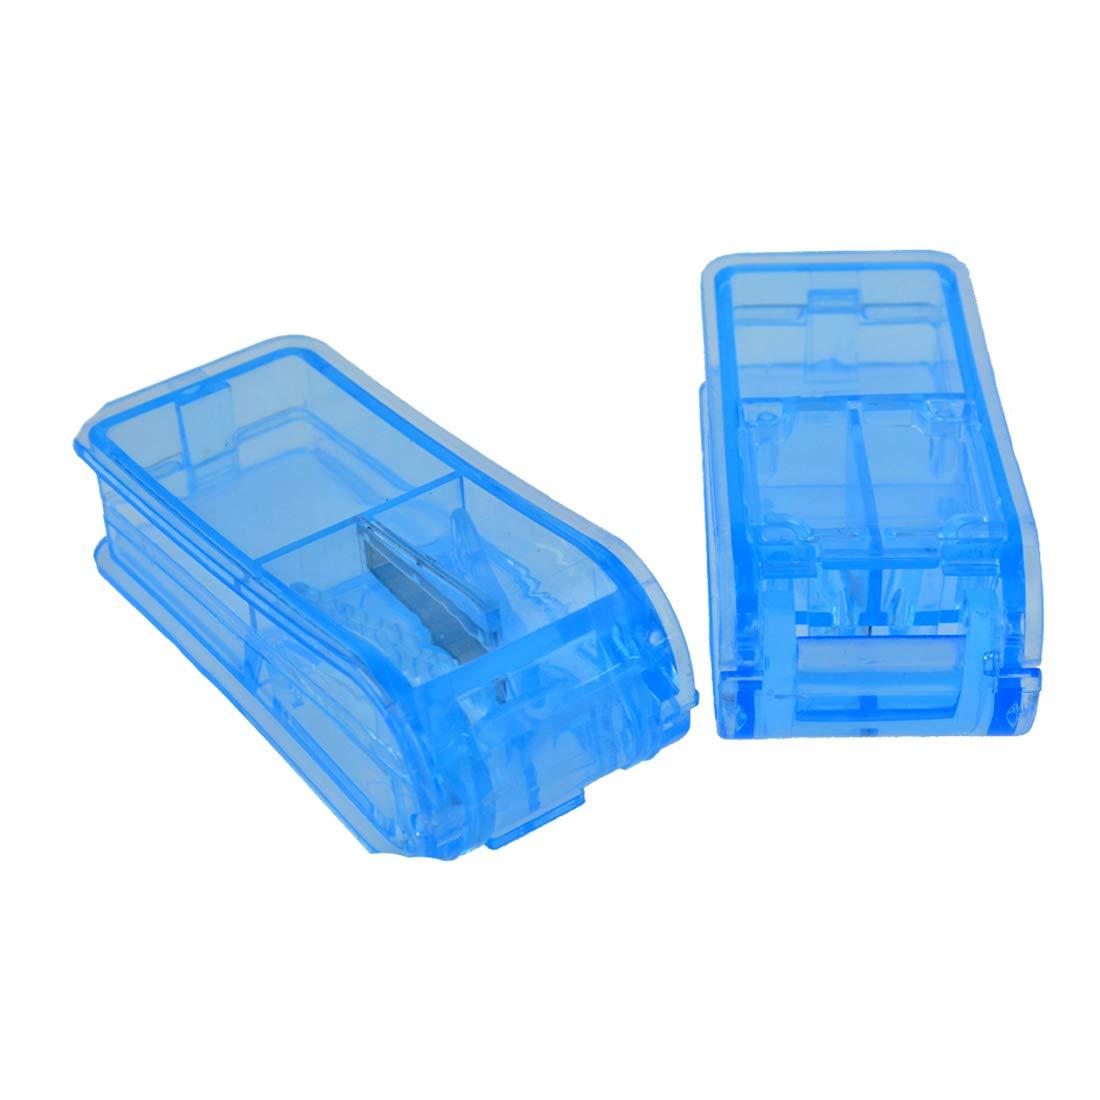 Lystaii 2pcs Pill Cutter Pill Splitter Pill Divider Dispenser Blue Plastic for Cutting Medication Tablets in Half